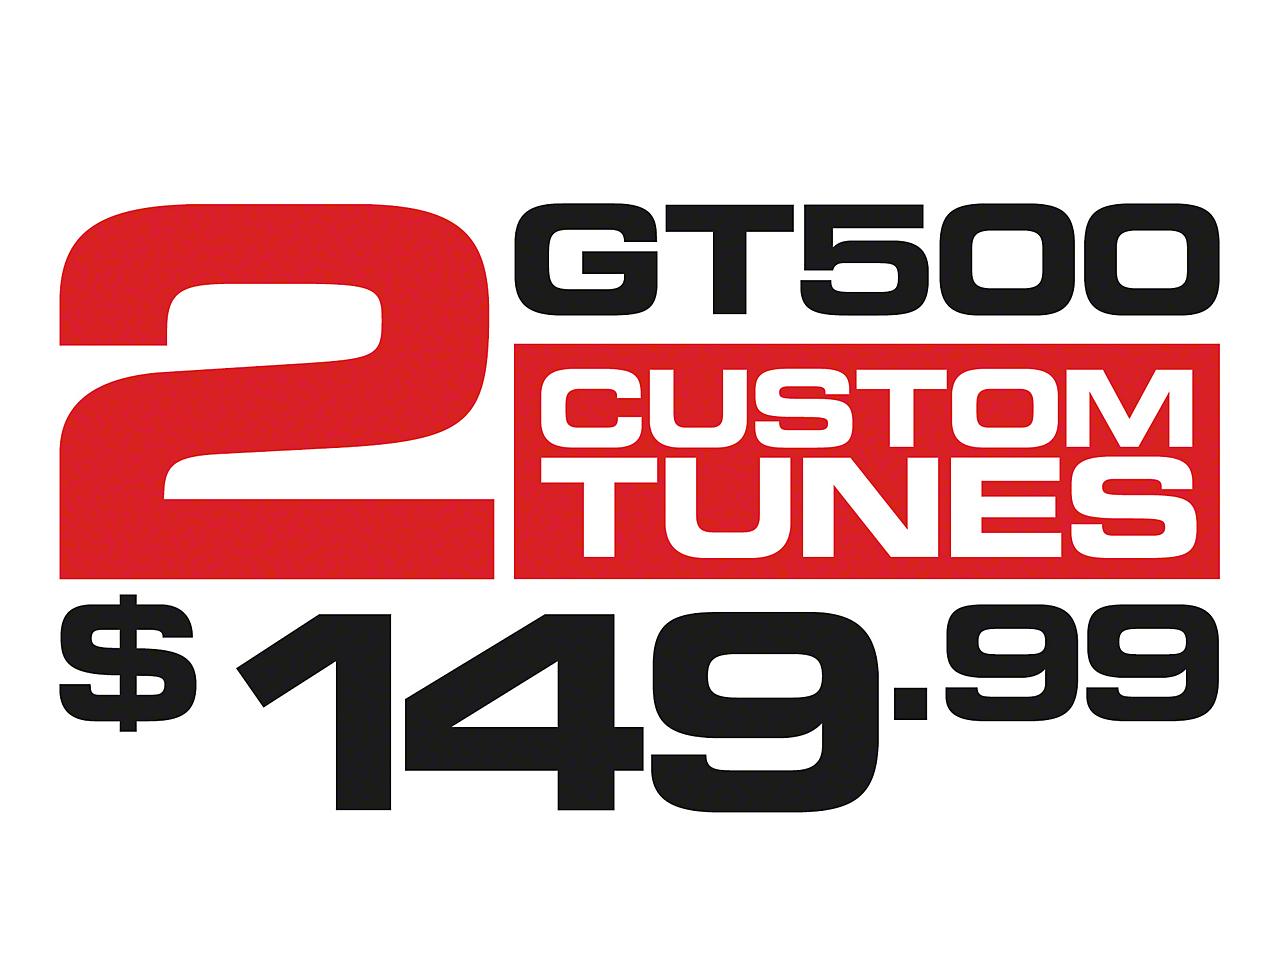 Bama 2 Custom Tunes (07-09 GT500)